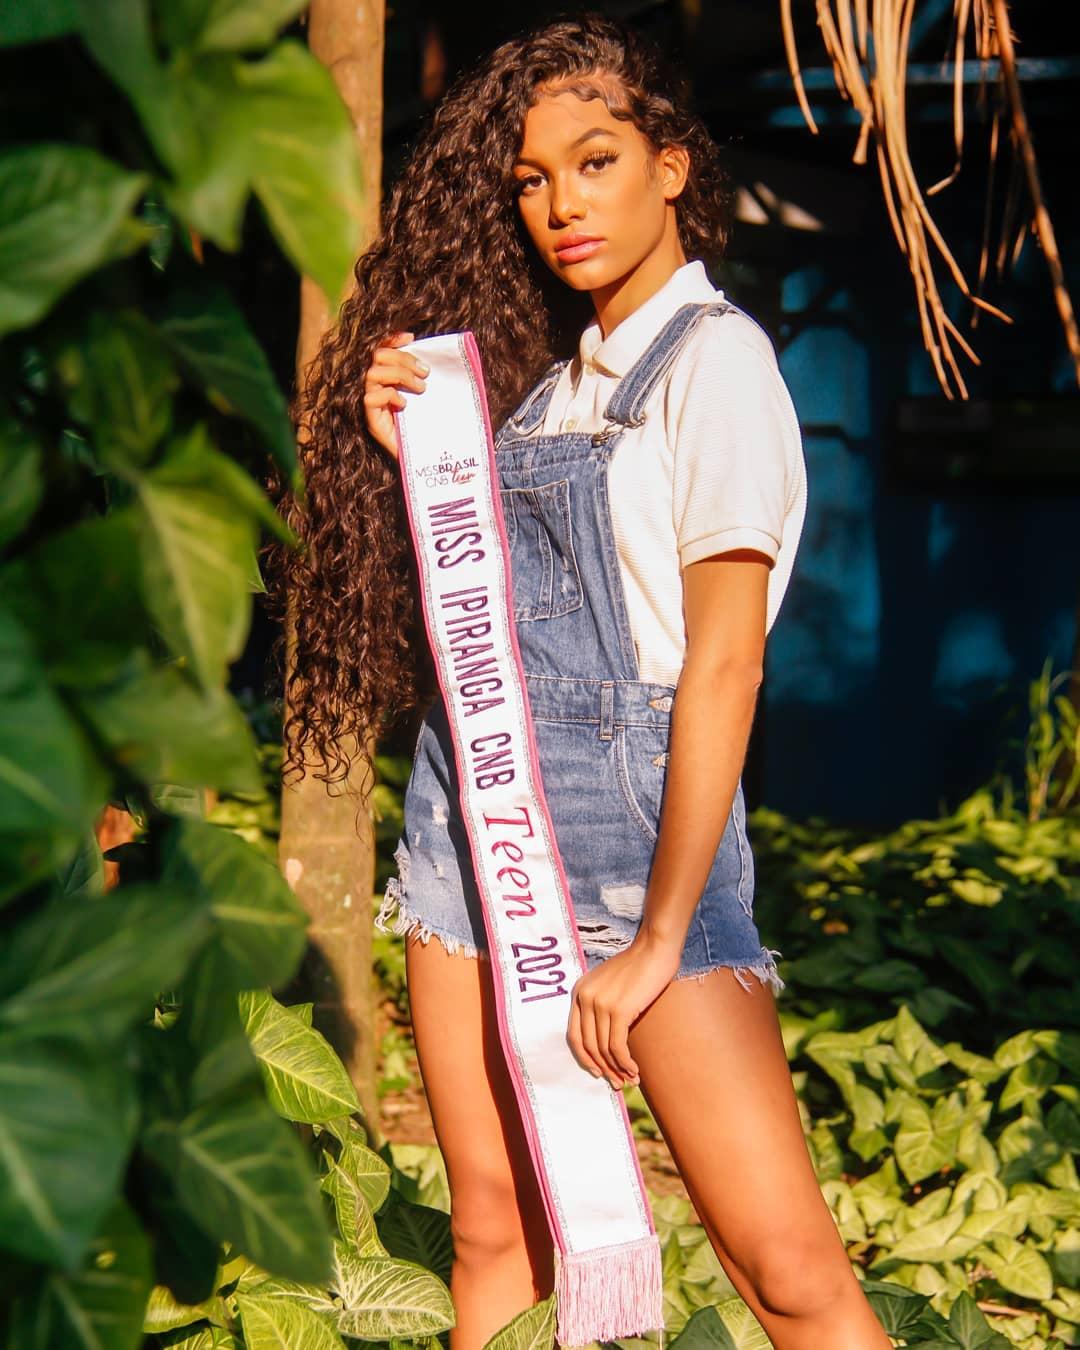 yasmin teles, miss teen brasil mundial 2021. 22031812